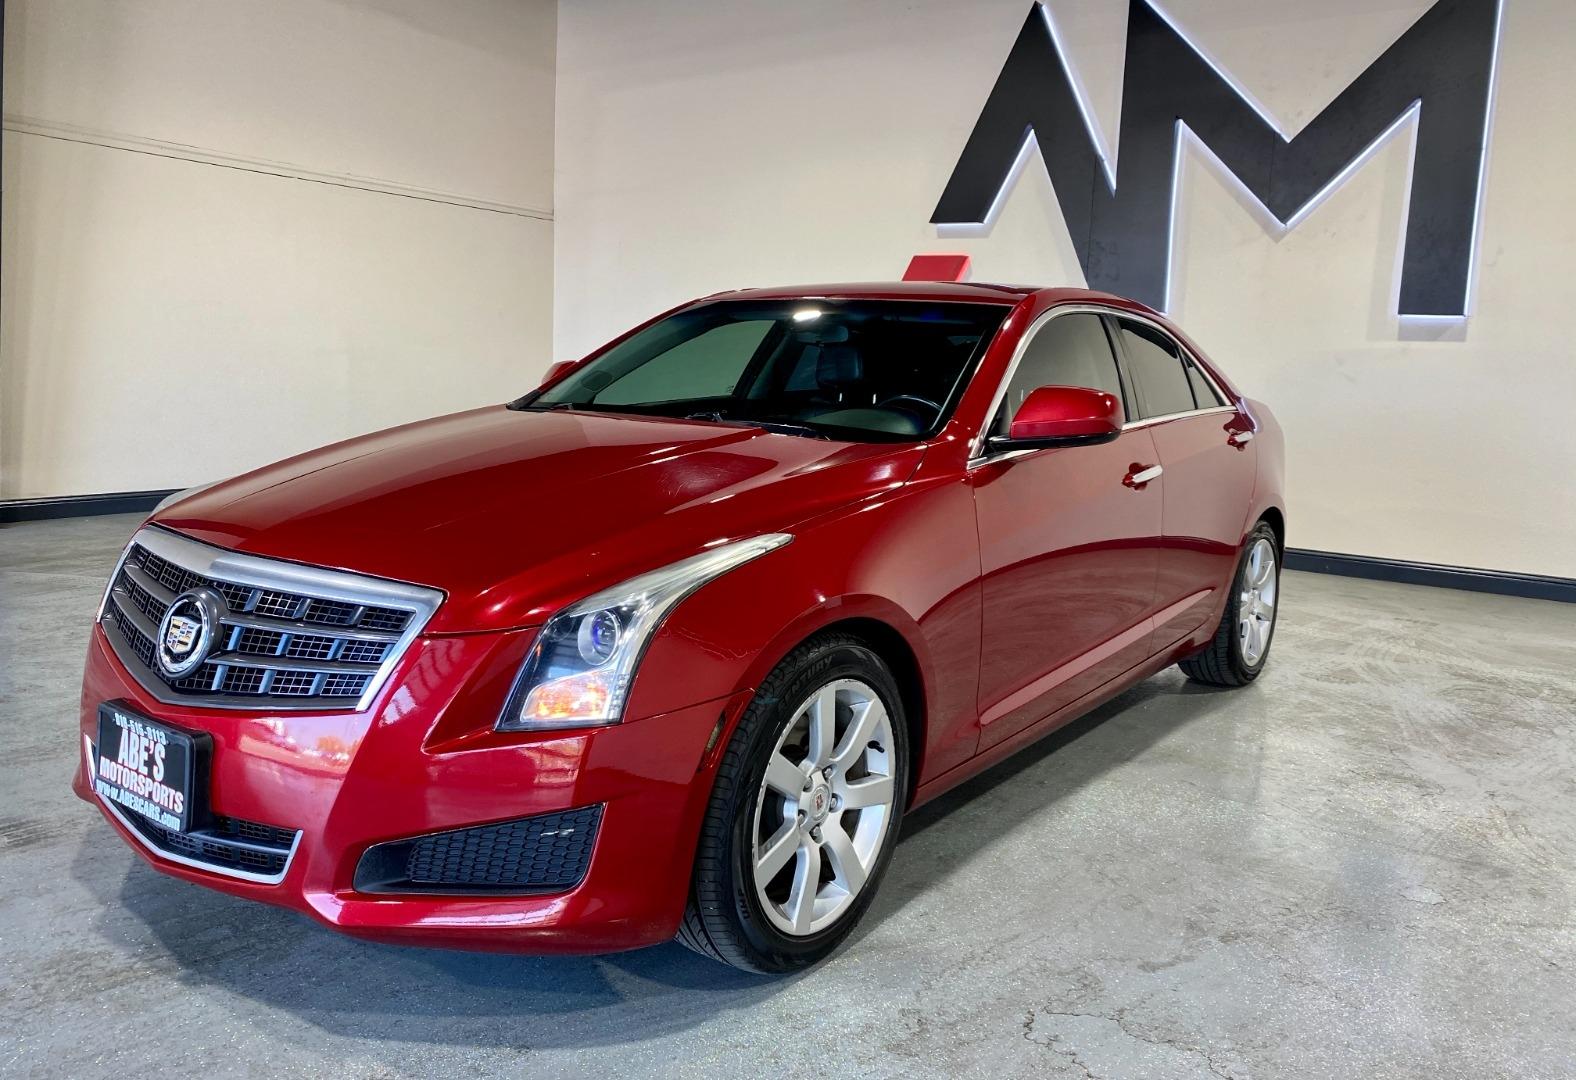 2013 Cadillac Ats 2 5l Rwd Abe S Motorsports Dealership In Sacramento